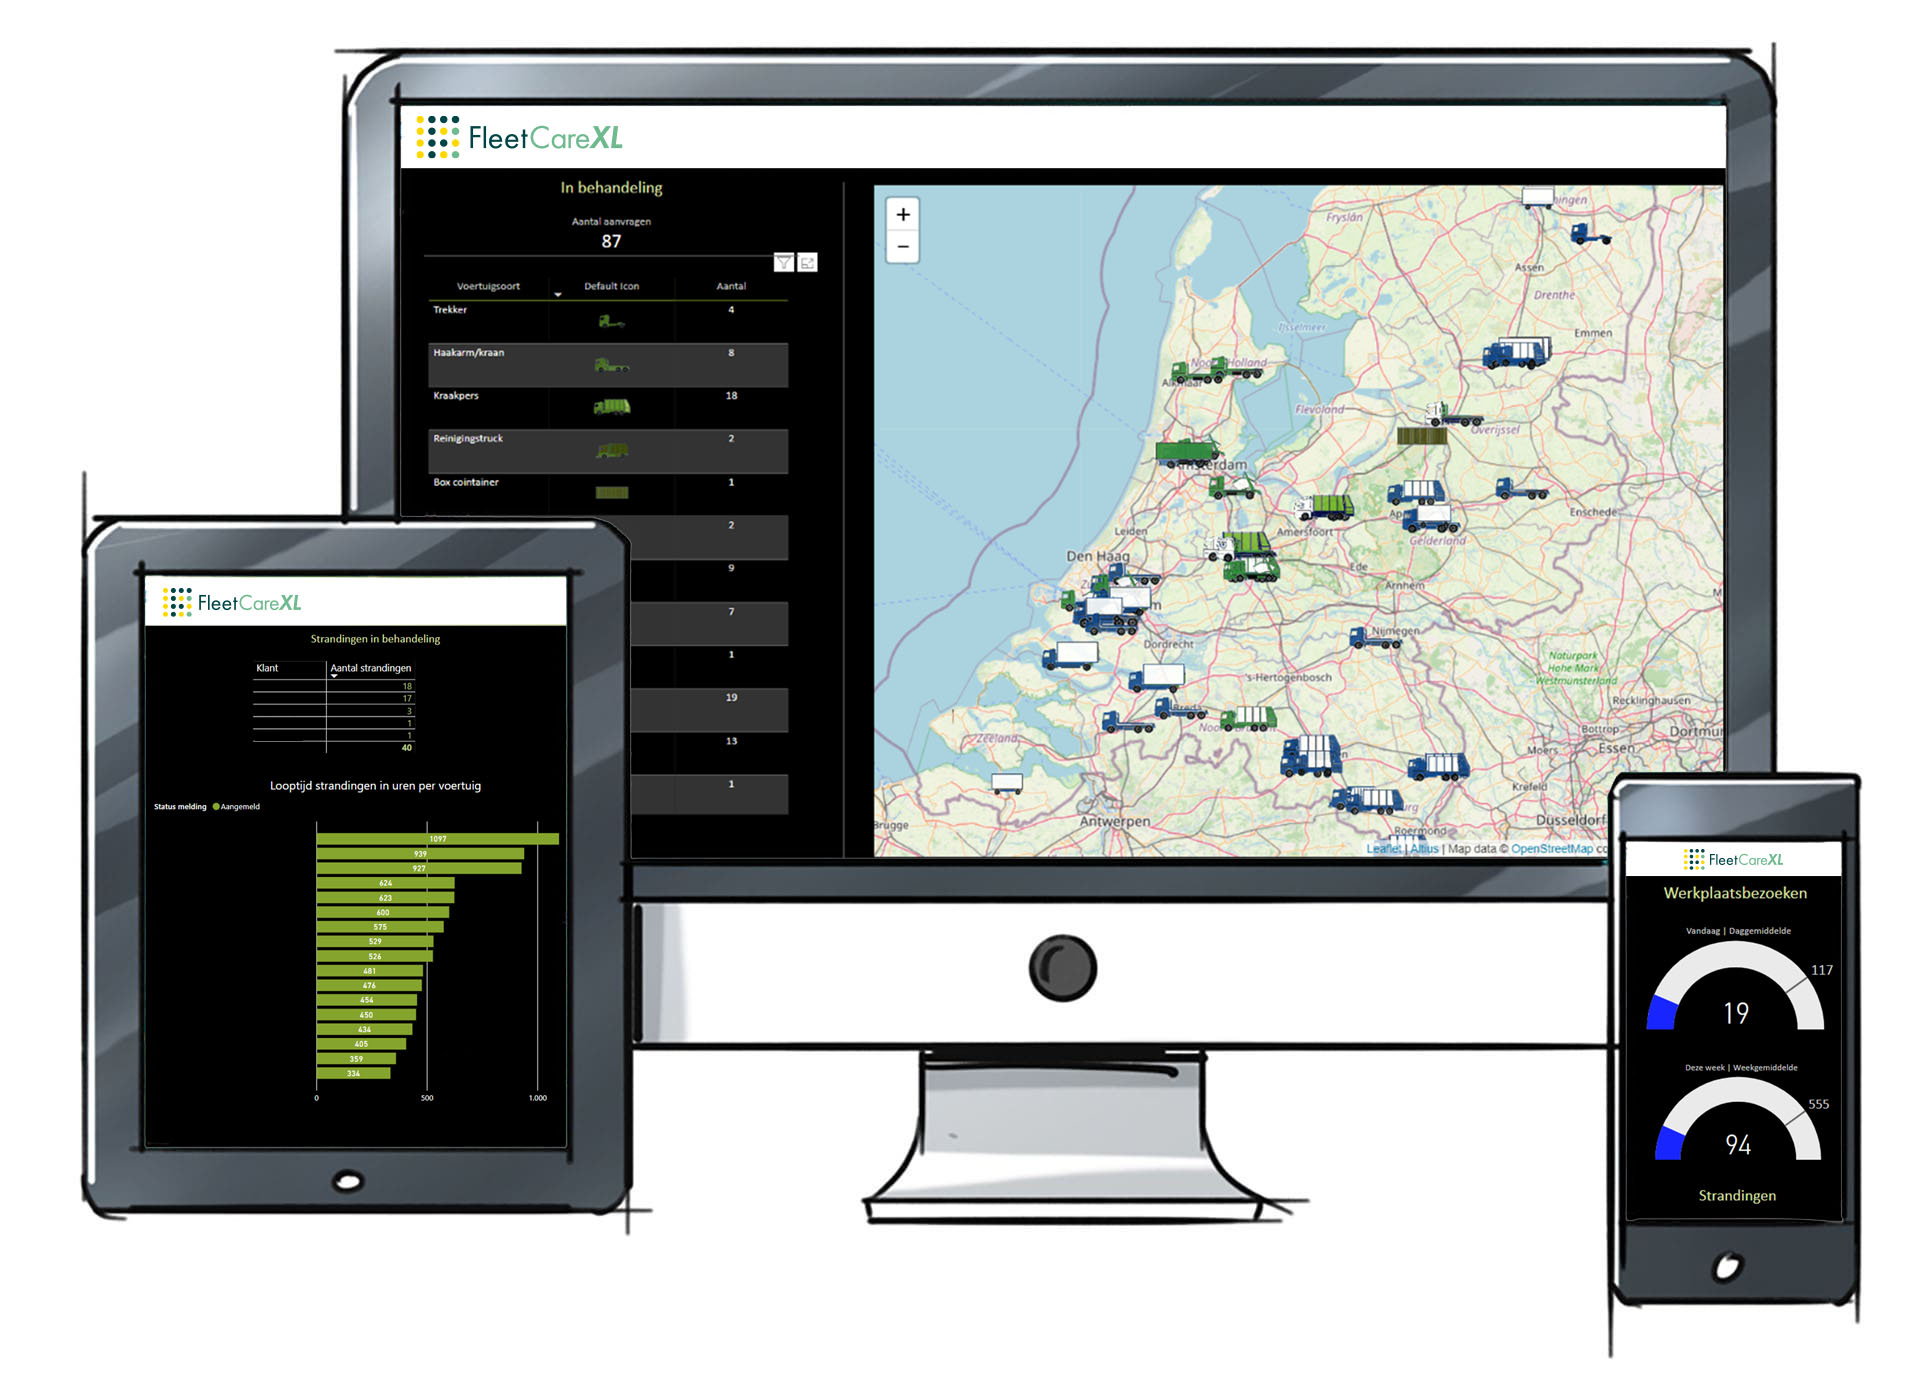 FleetGuide wagenparkbeheer software mock-up